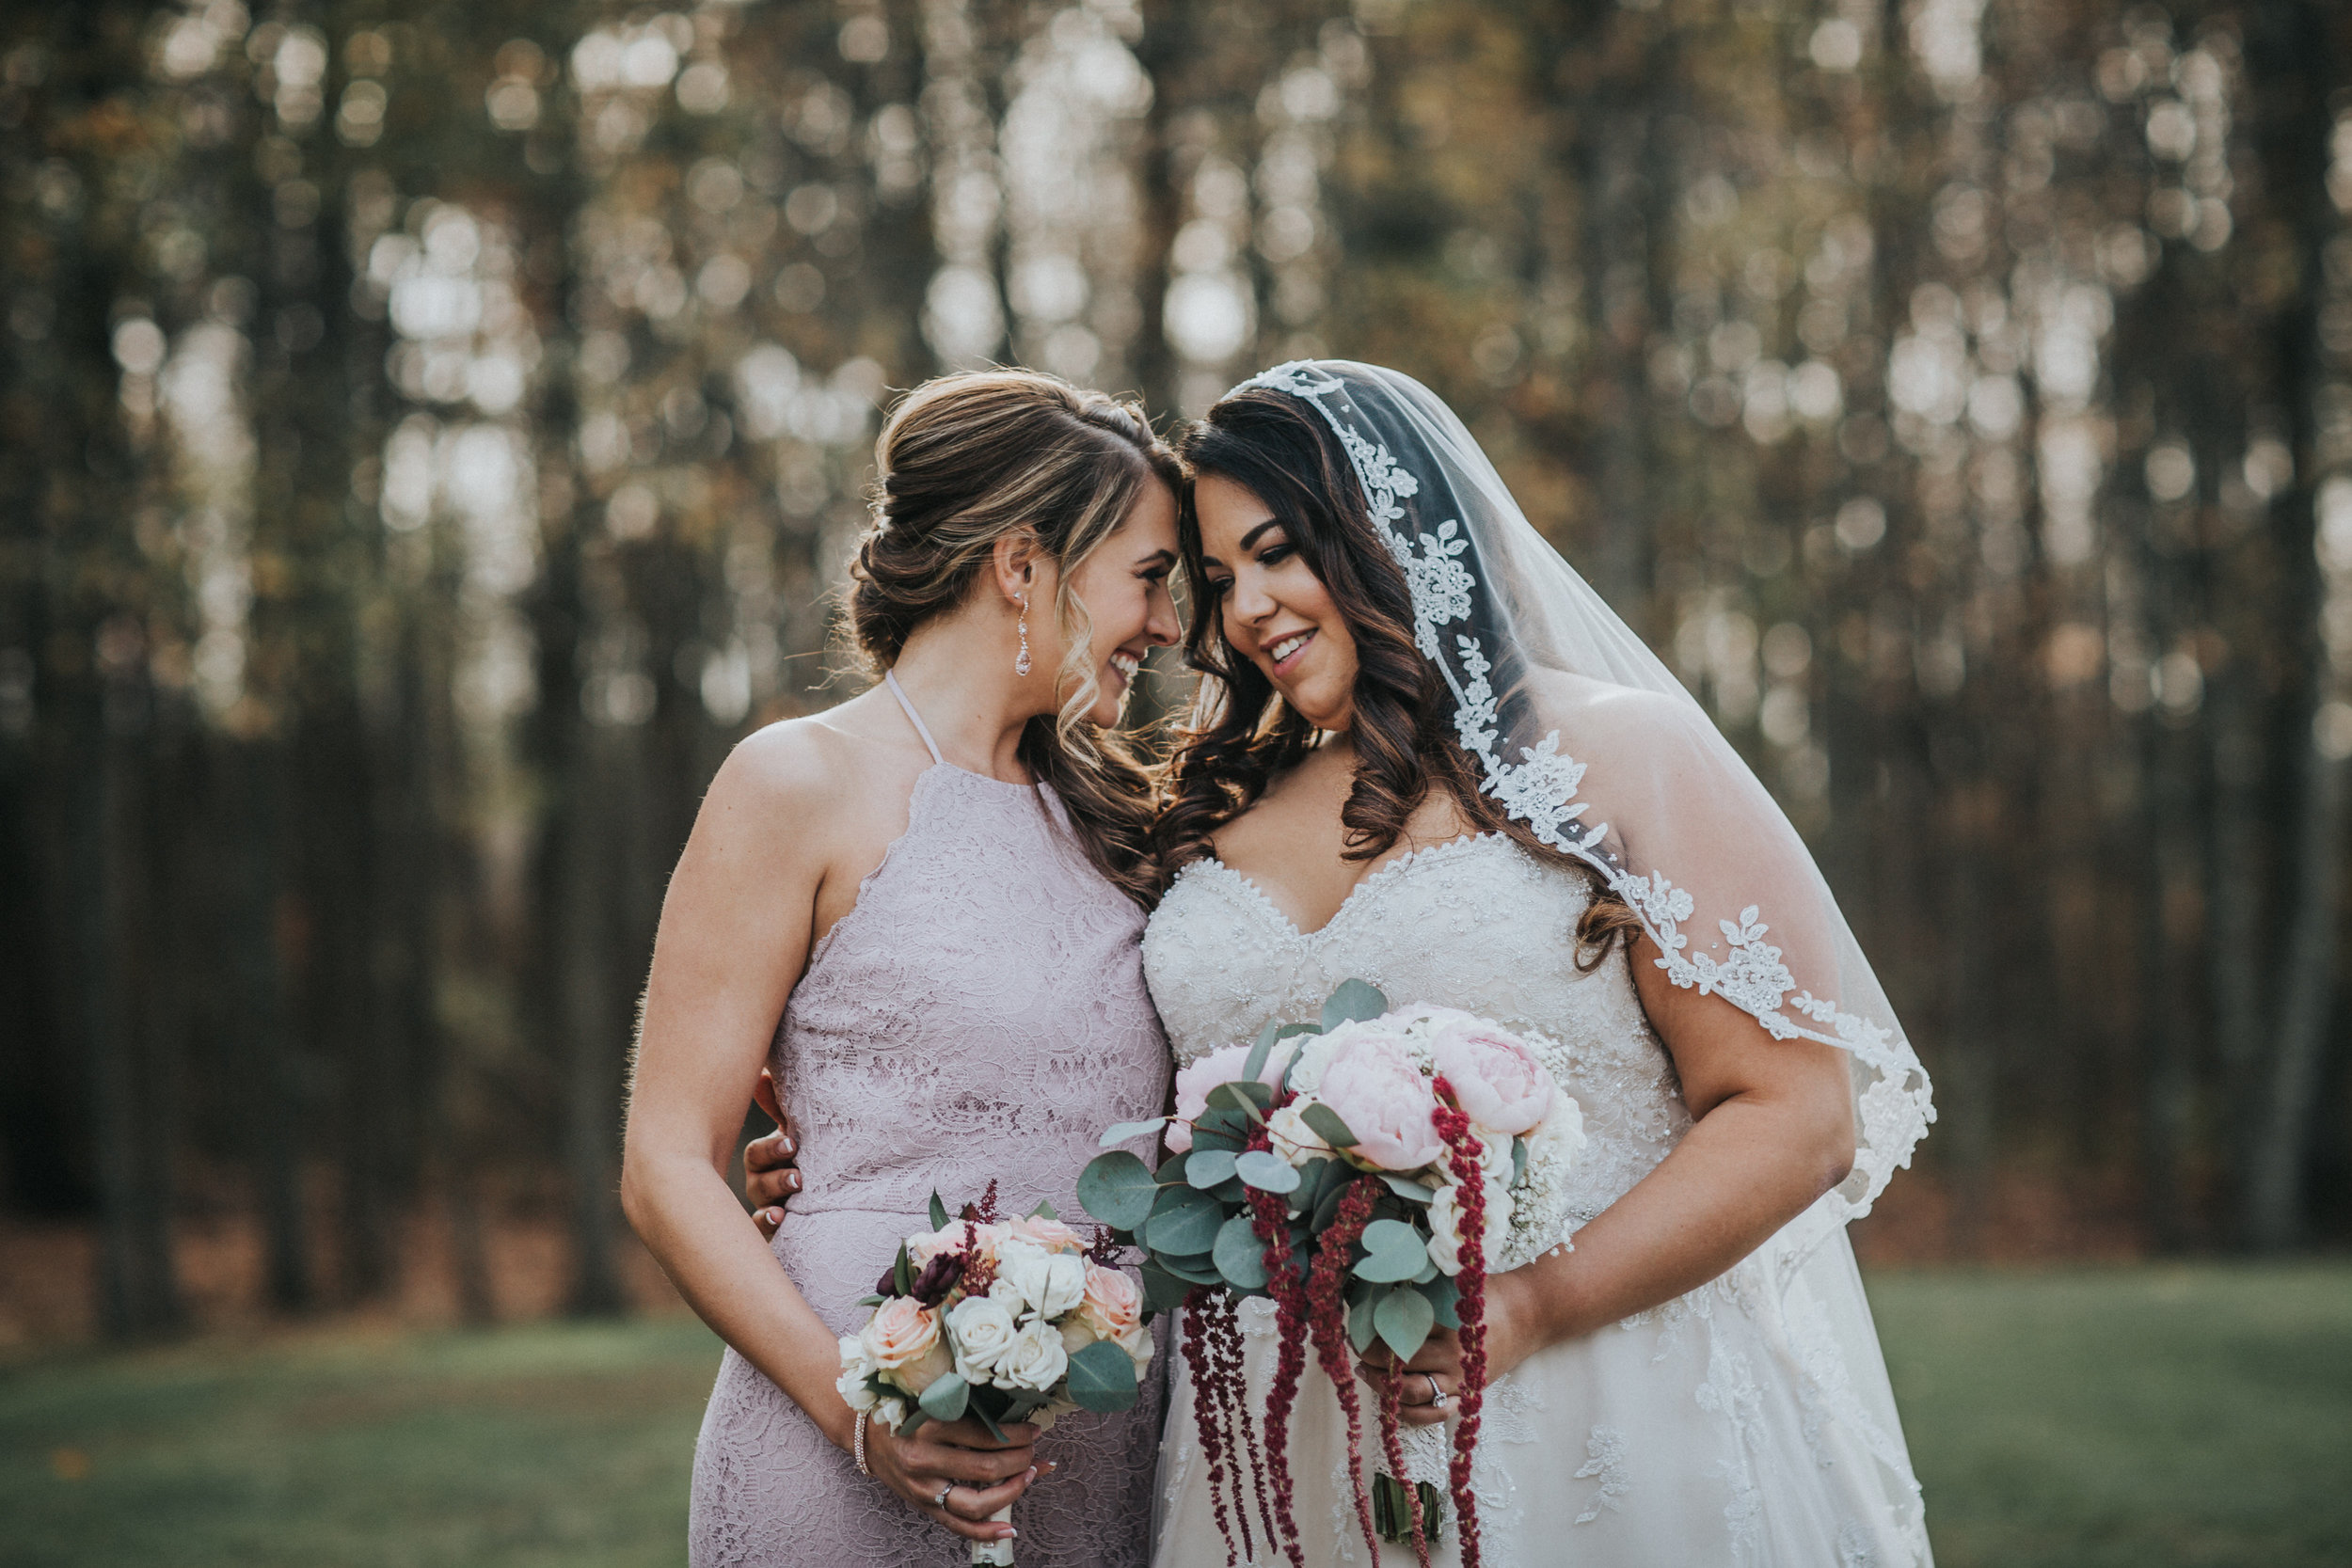 New-Jersey-Wedding-Photography-Brigalias-Deanna&Darryl-BridalParty-7.jpg